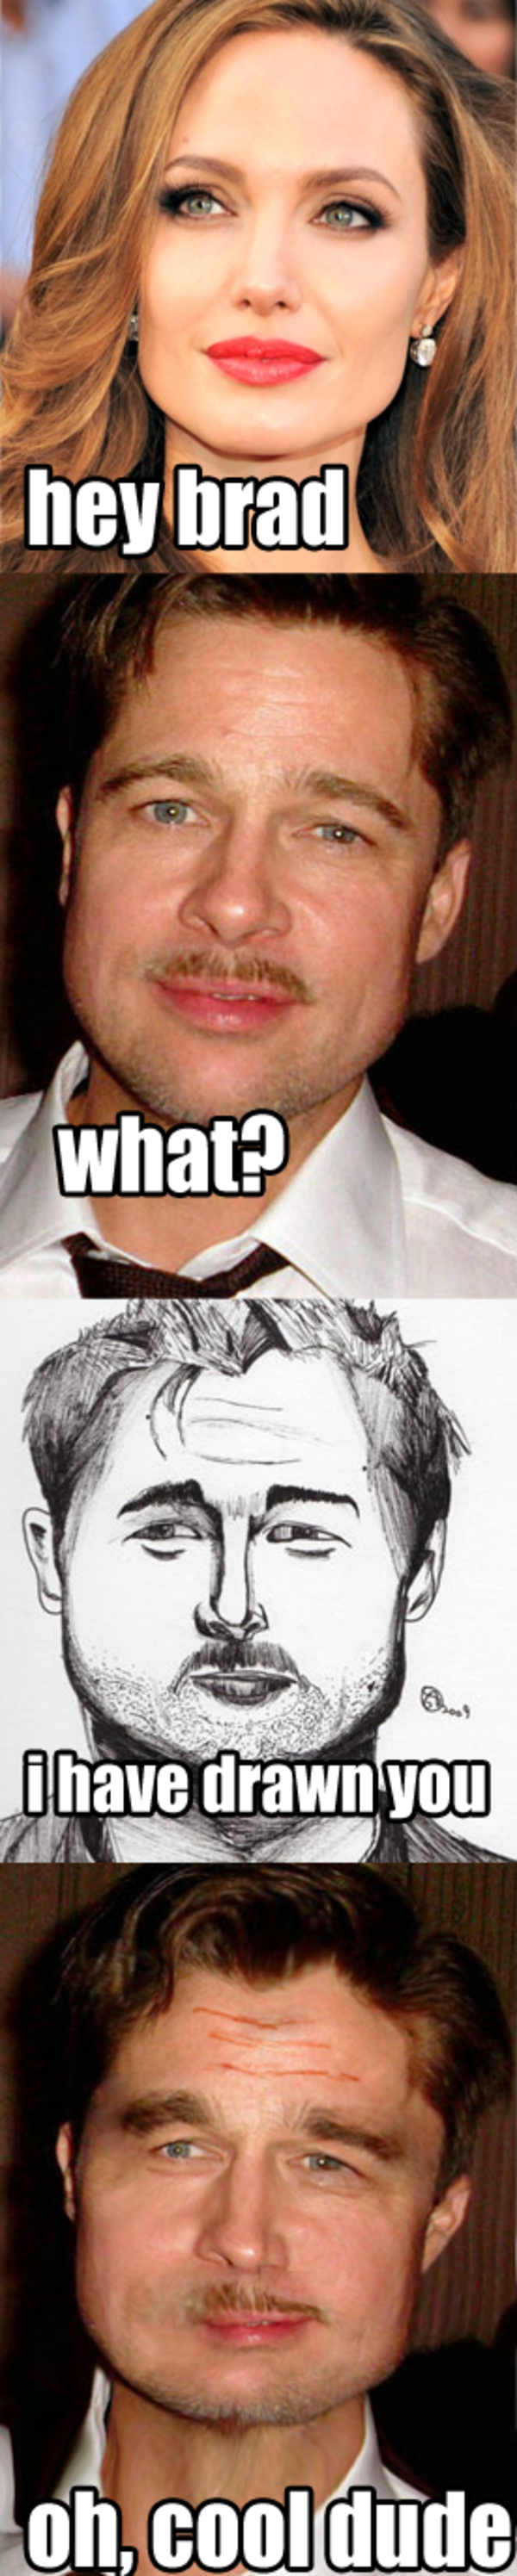 have drawn you, Brad |...